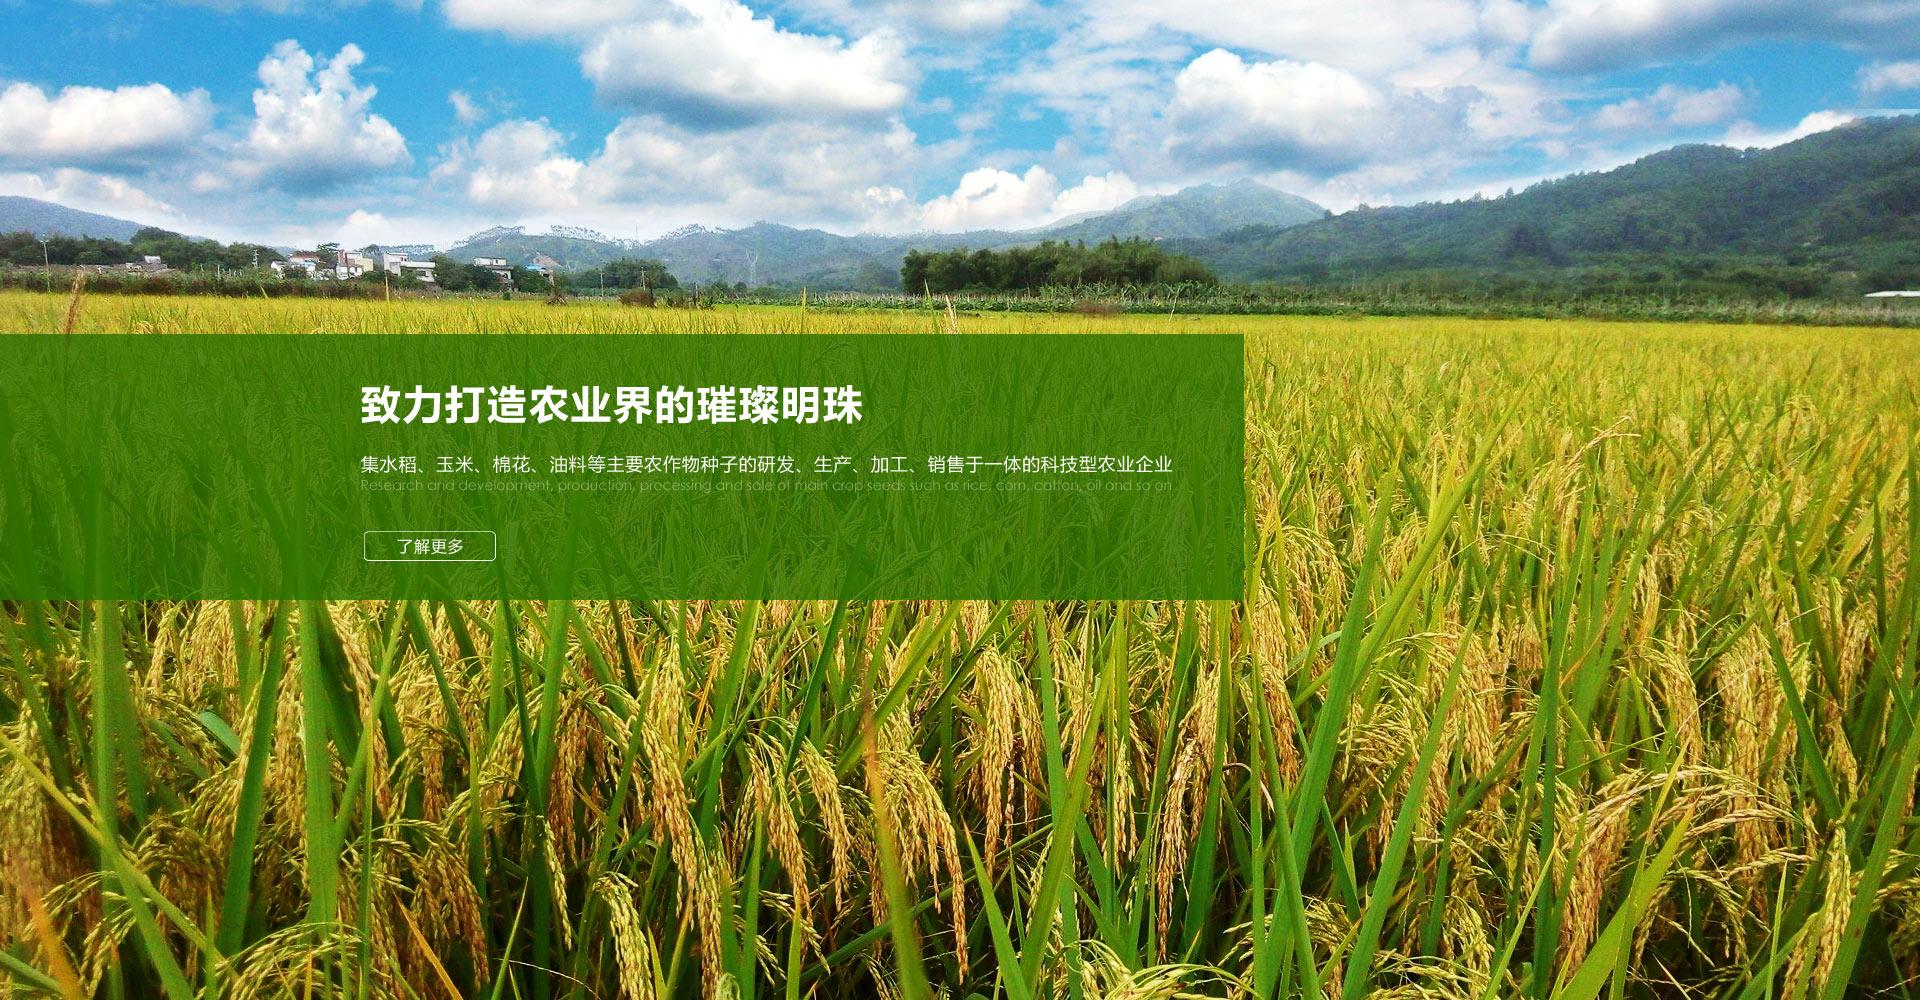 http://1707180009.pool1-site.make.yun300.cn/zjjg.html?t=1510155437563